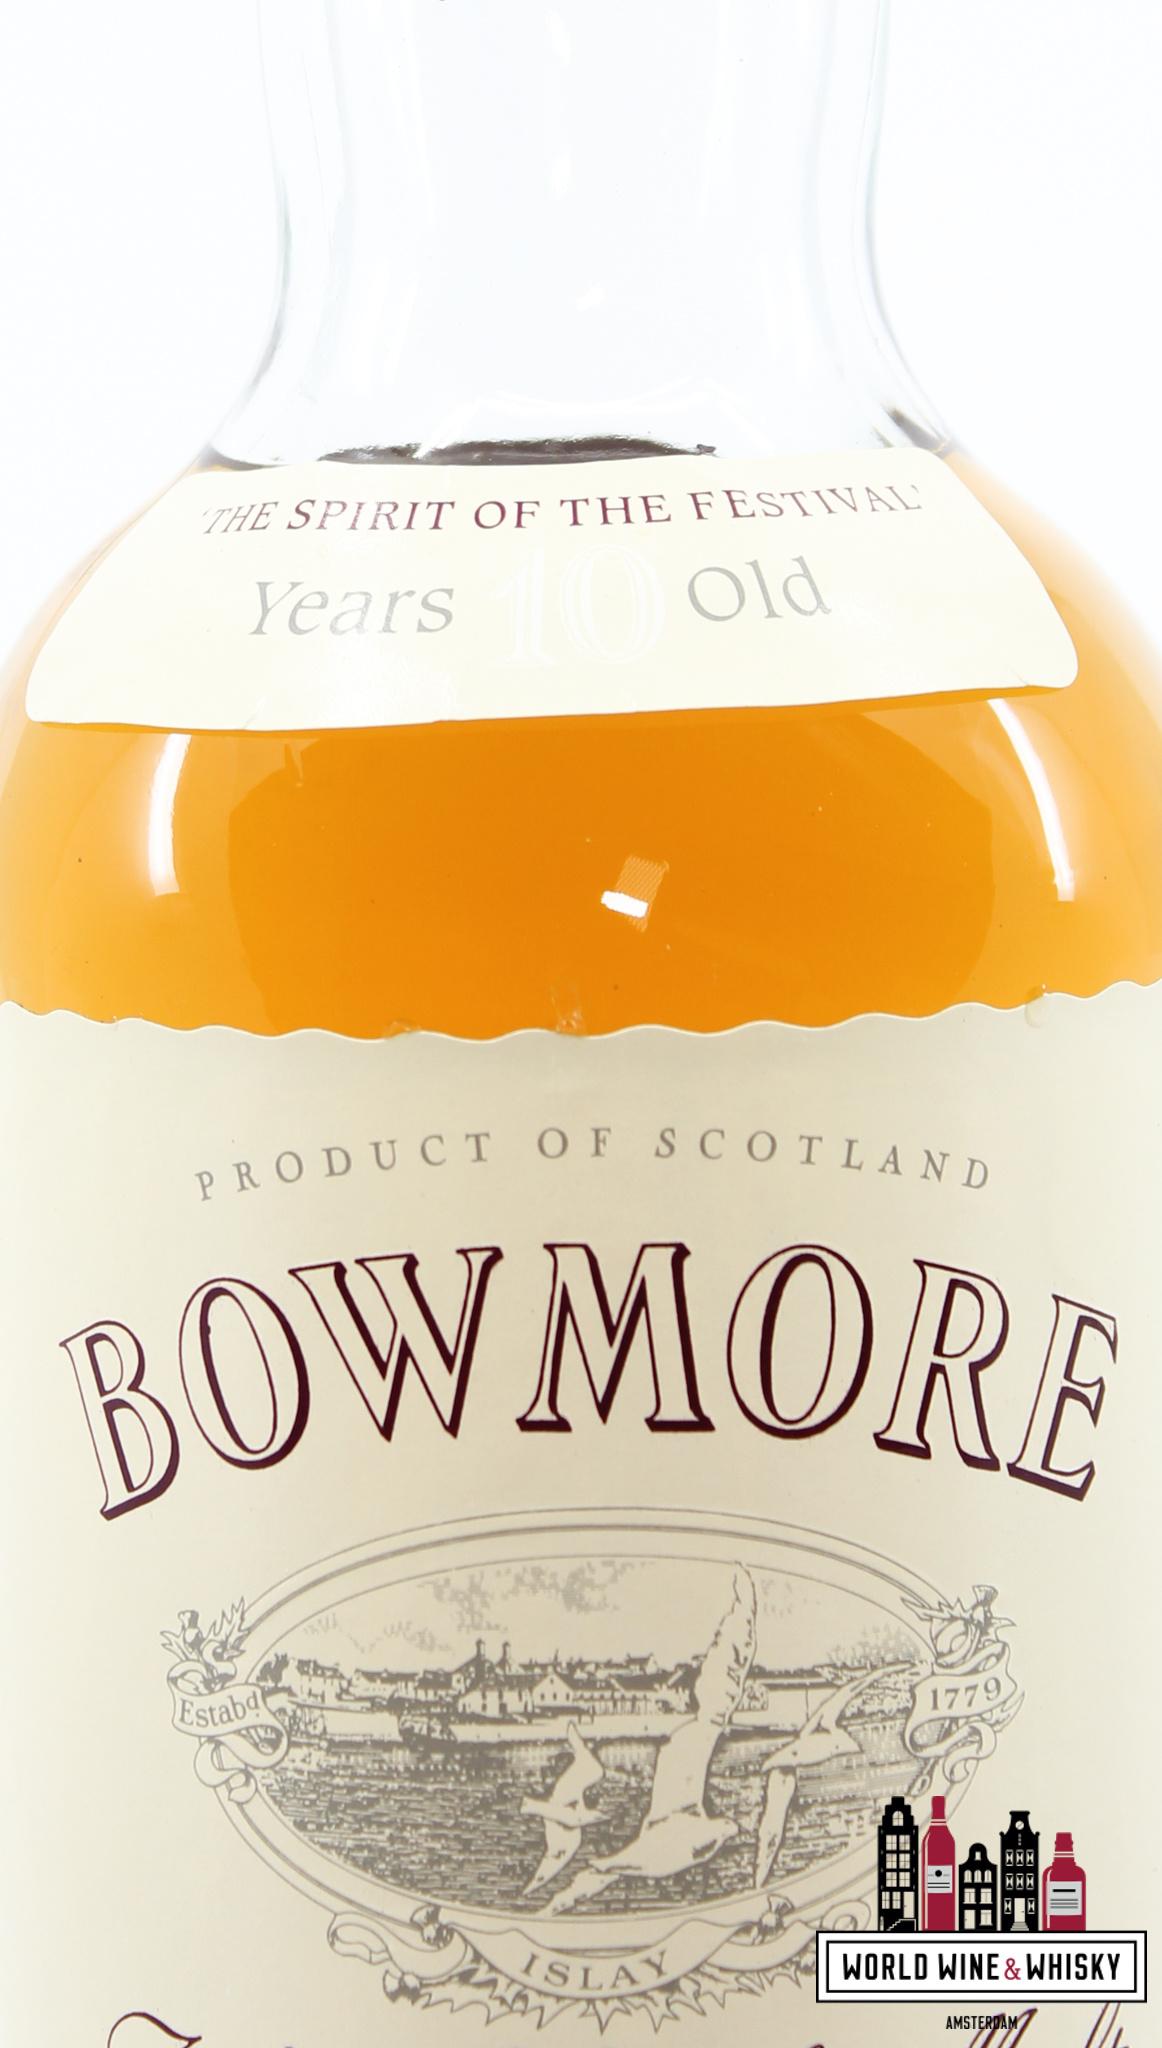 Bowmore Bowmore 10 Years Old 1988 - Glasgow Garden Festival '88 40% 750ml